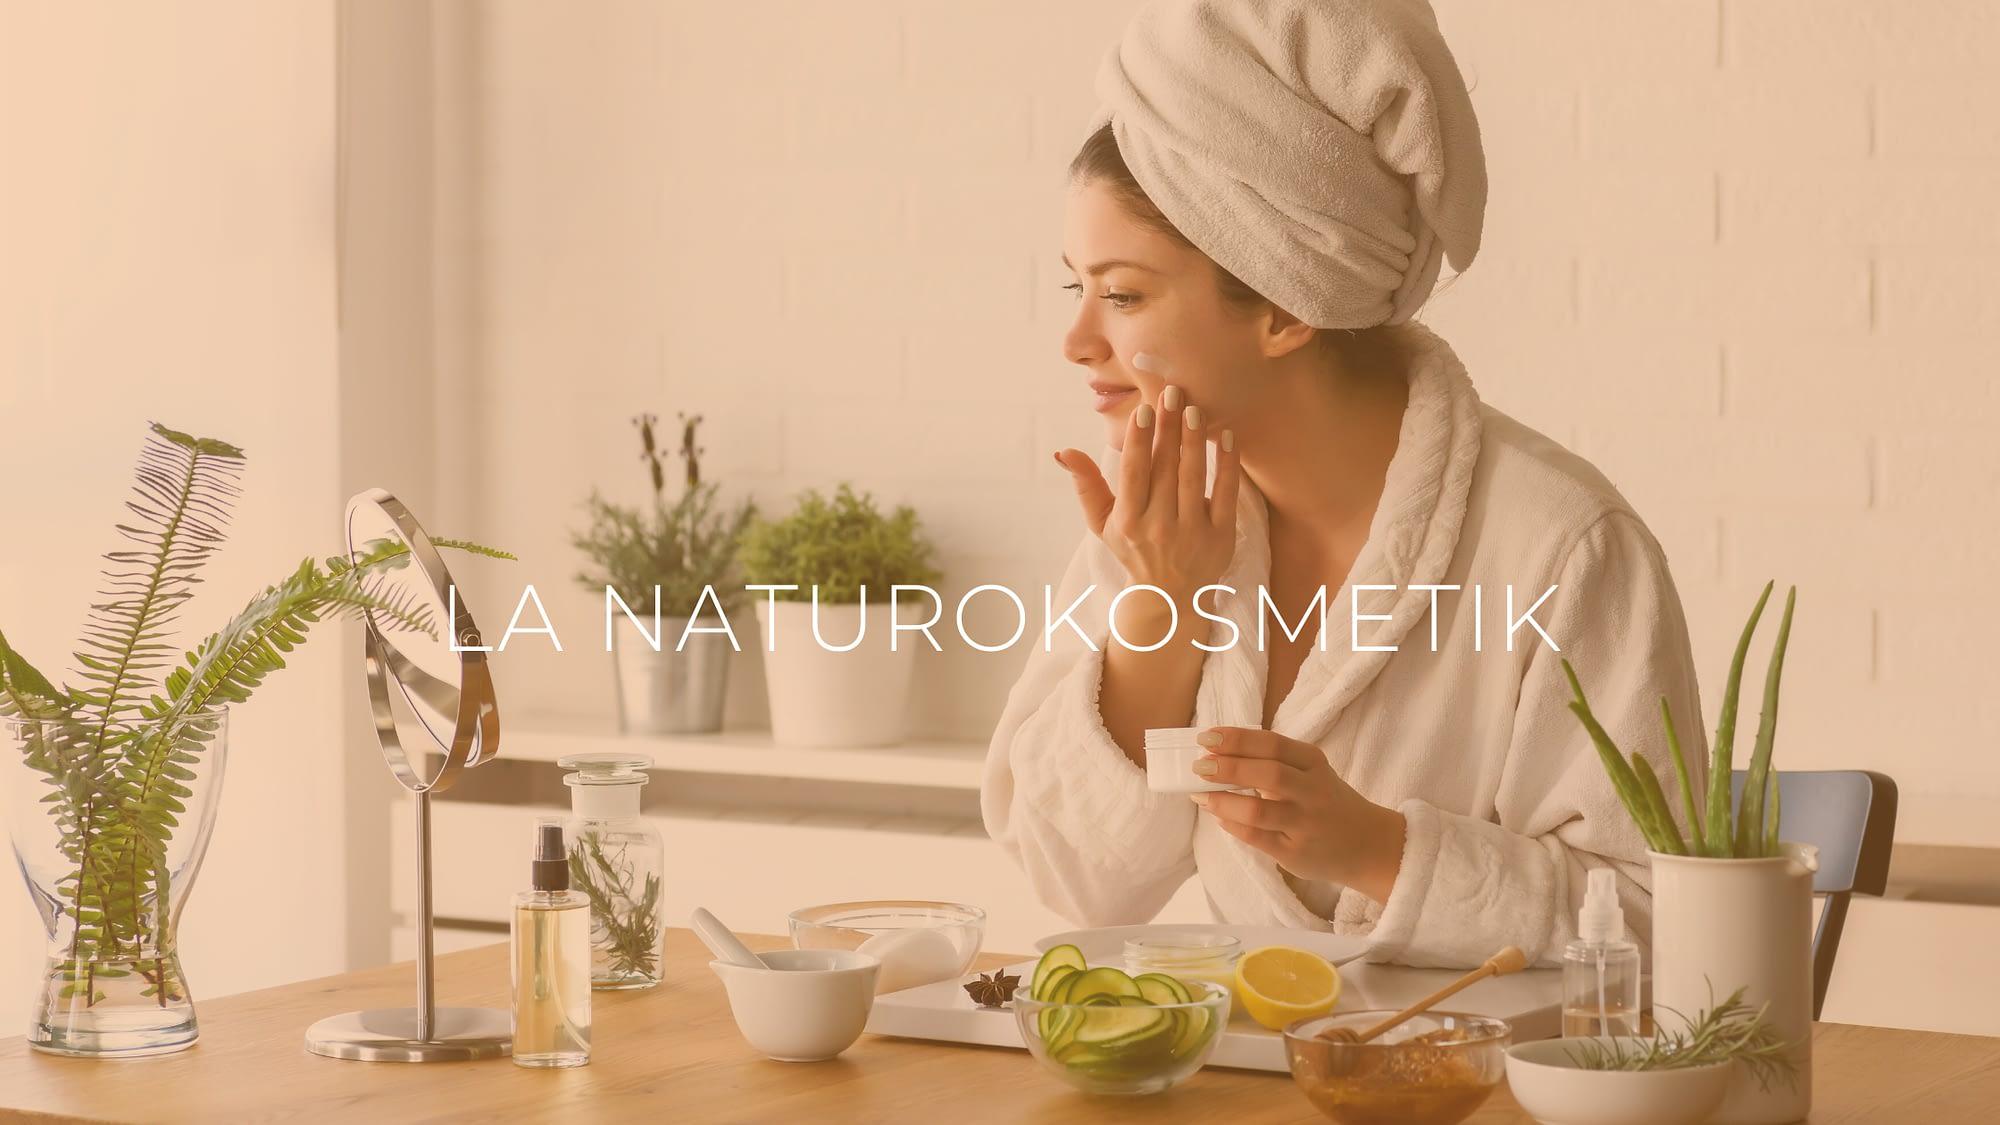 Pour tout savoir sur la naturokosmetik